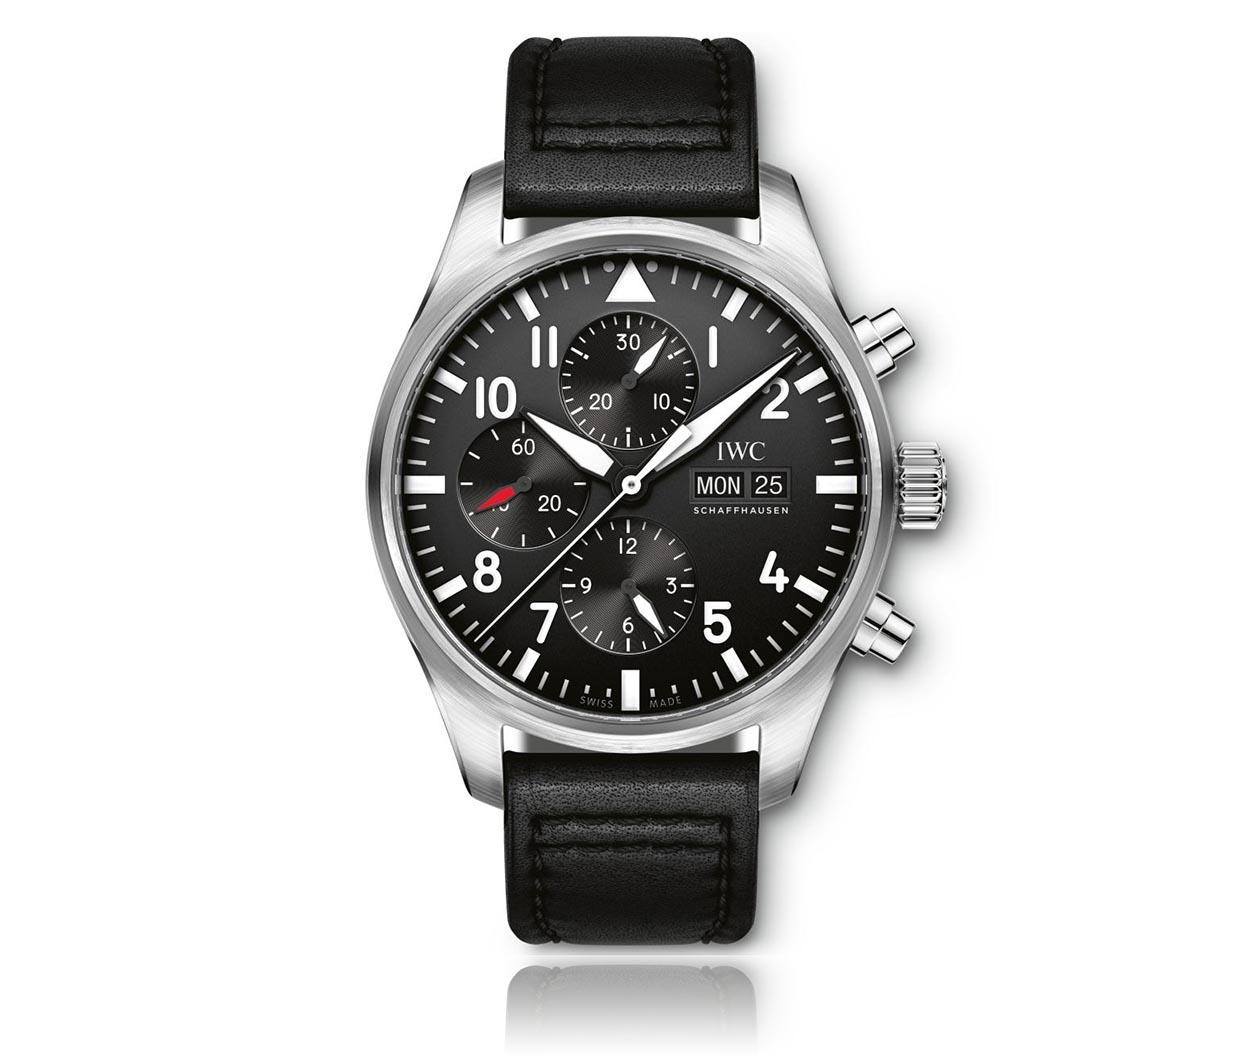 IWC PilotsWatch Chronograph IW377709 Carousel 1 FINAL